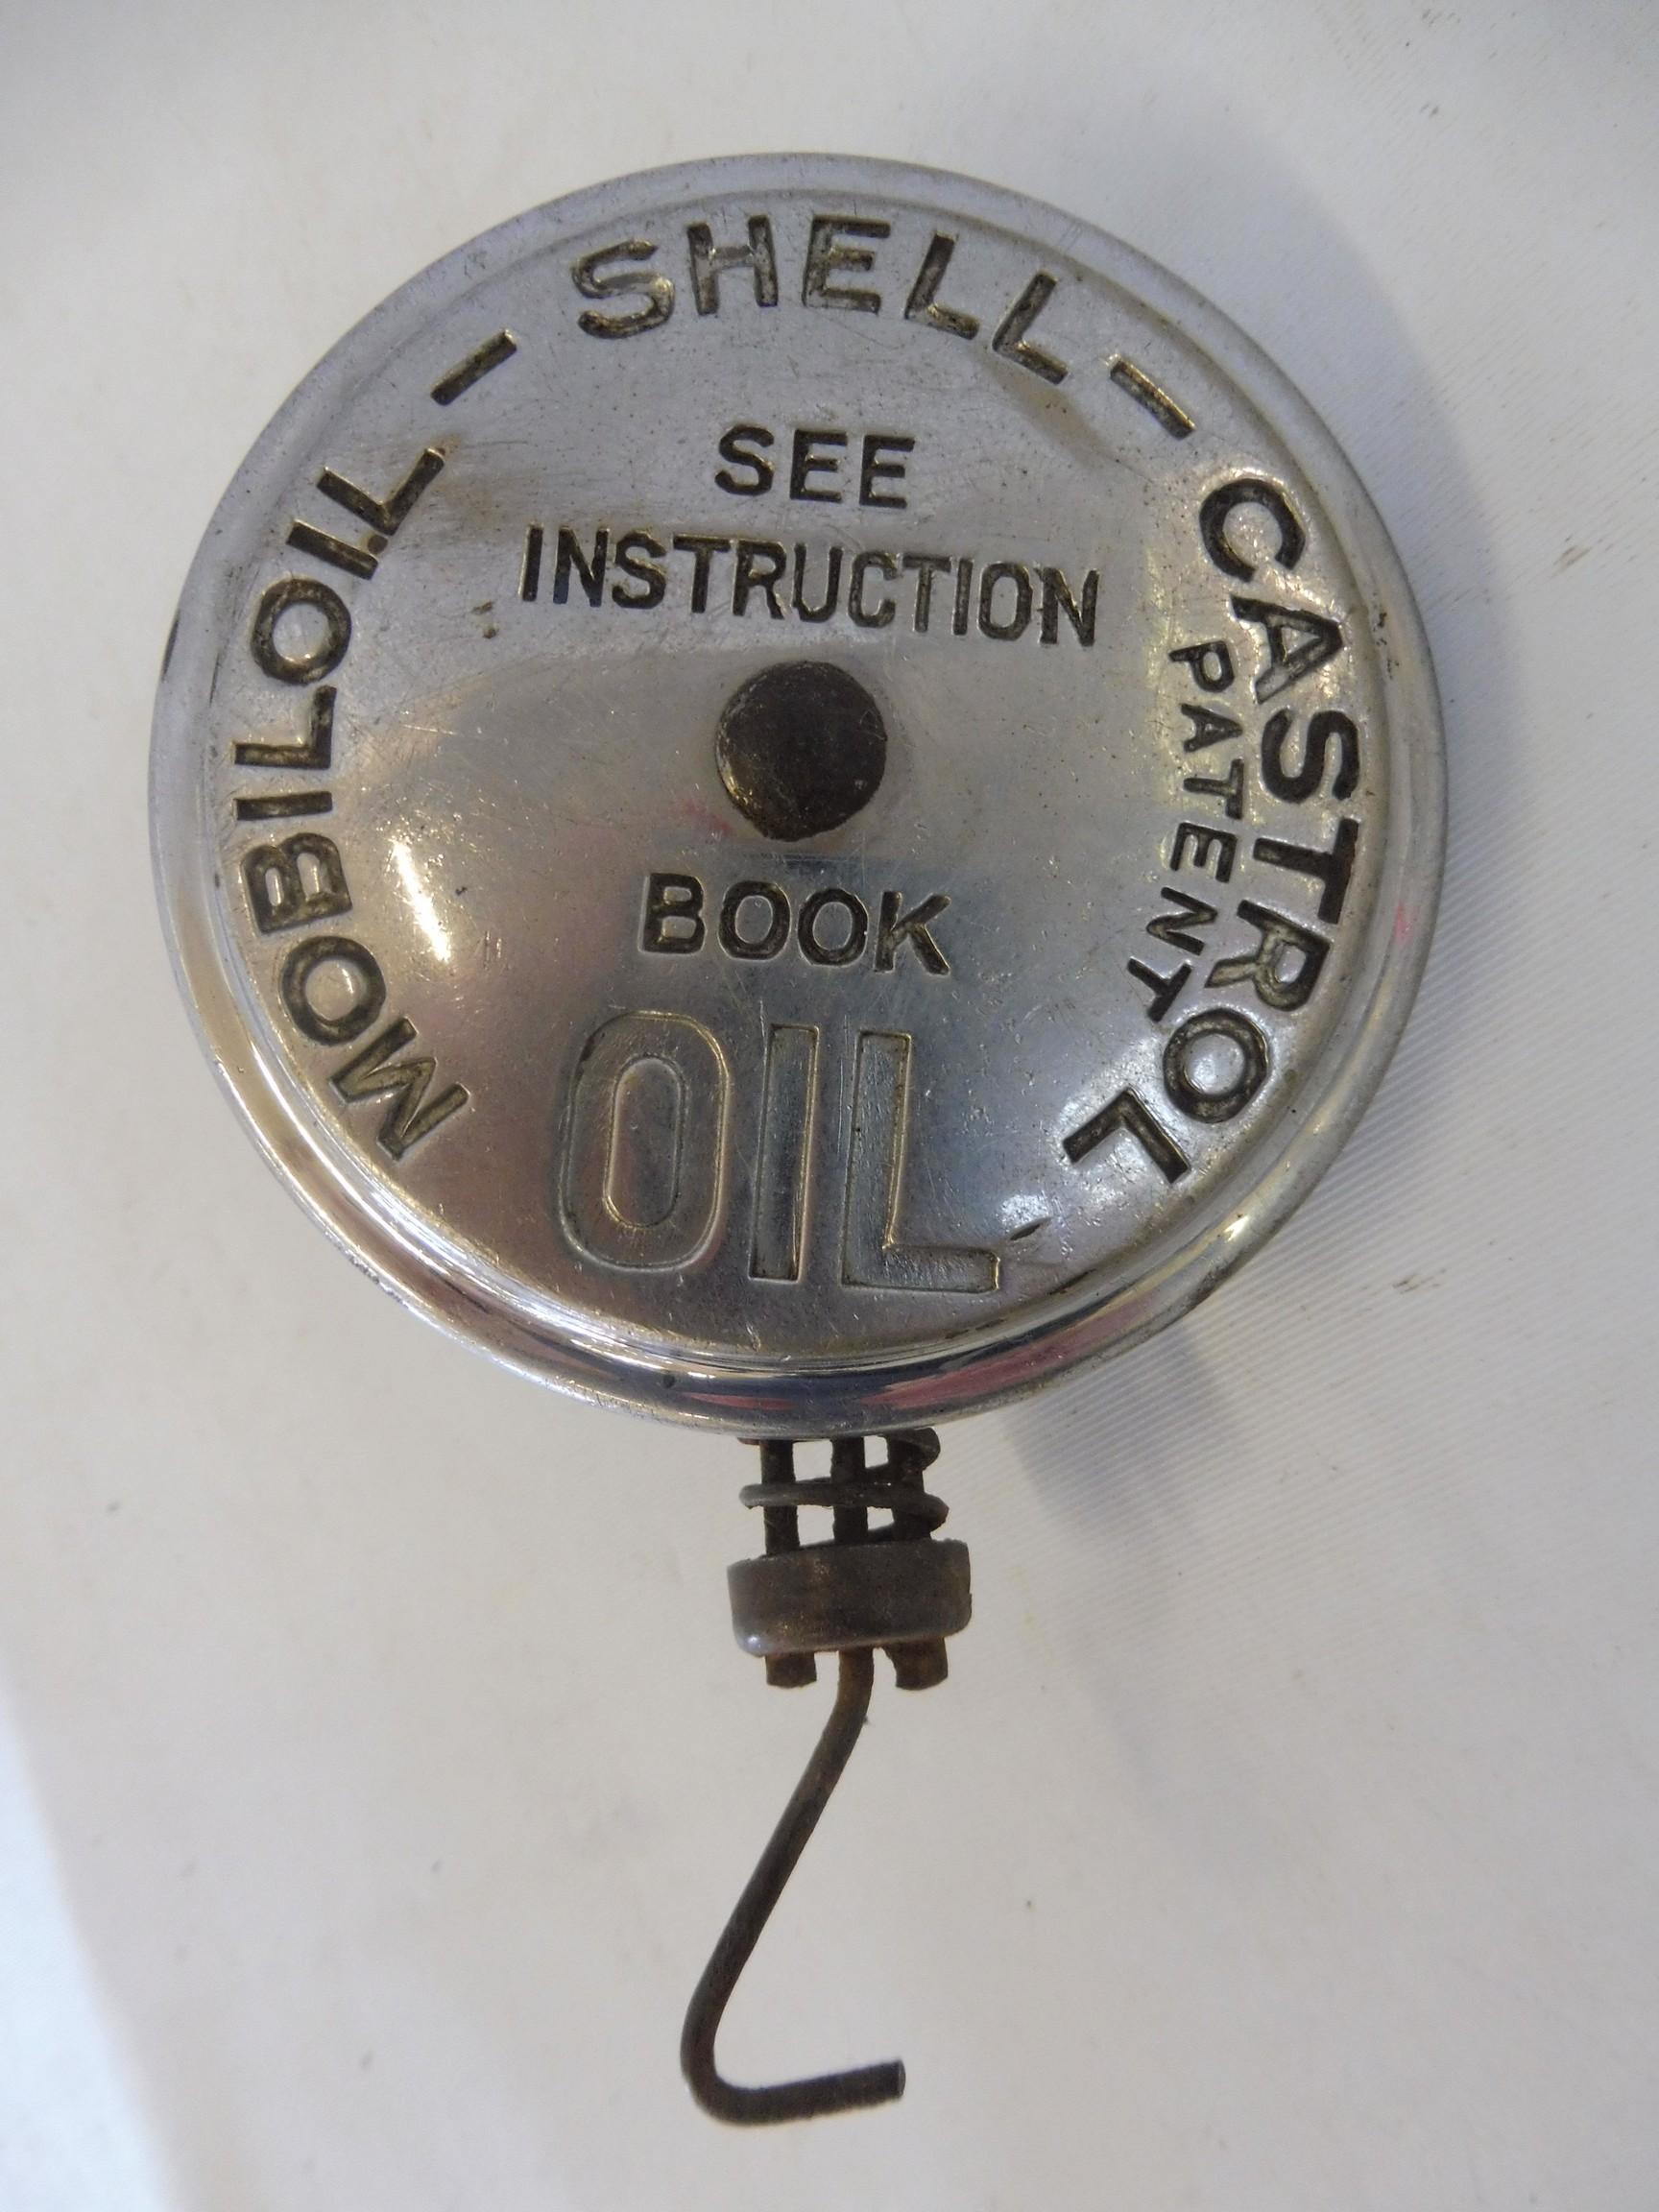 A Mobiloil-Shell-Castrol oil filter cap.